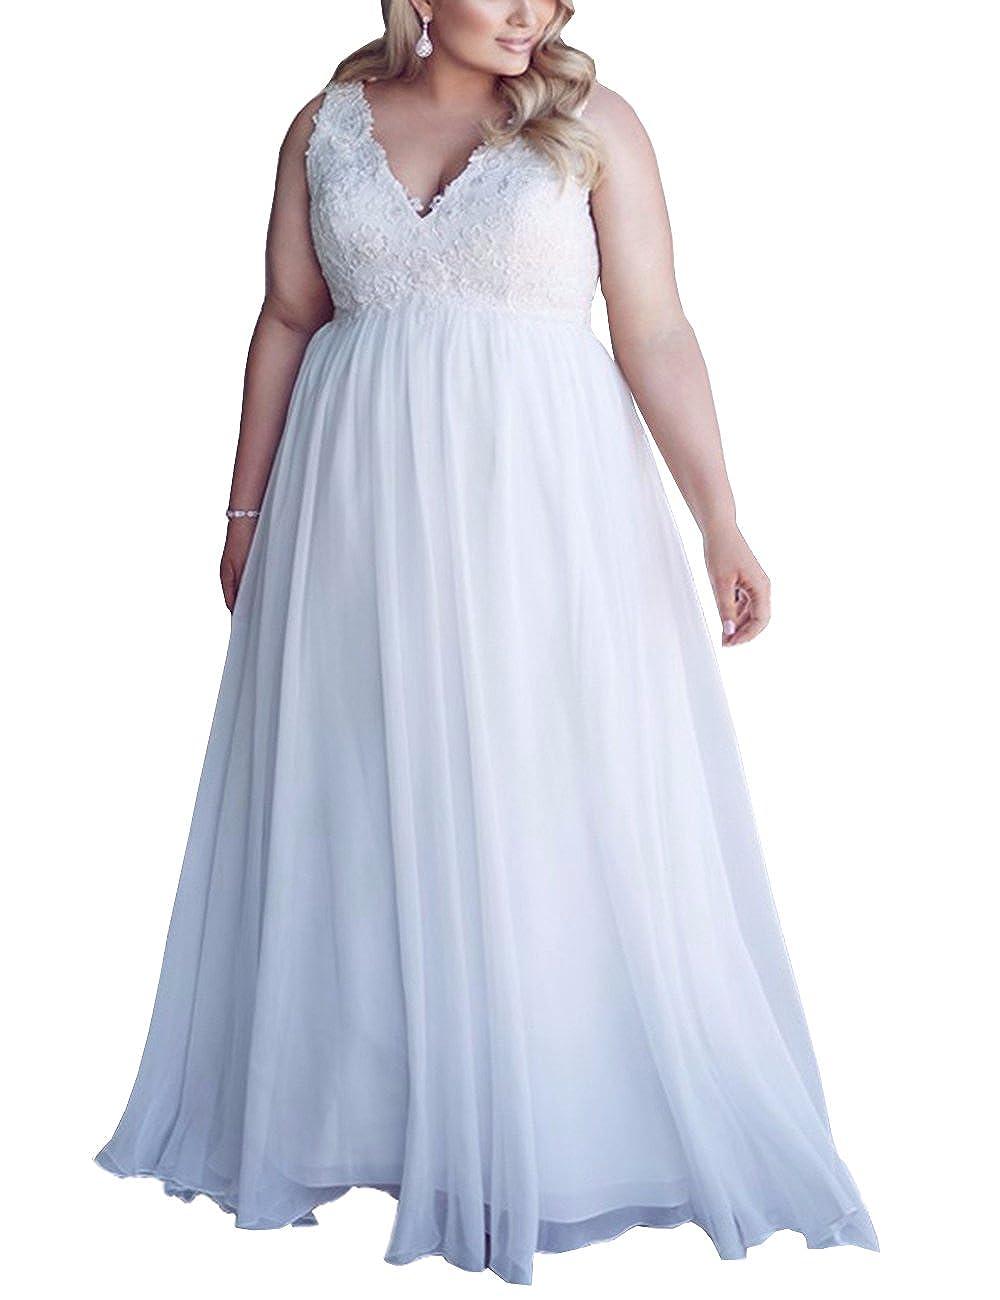 Mulanbridal Chiffon Applique Beach Wedding Dress Long Formal Prom Evening Gown ML241